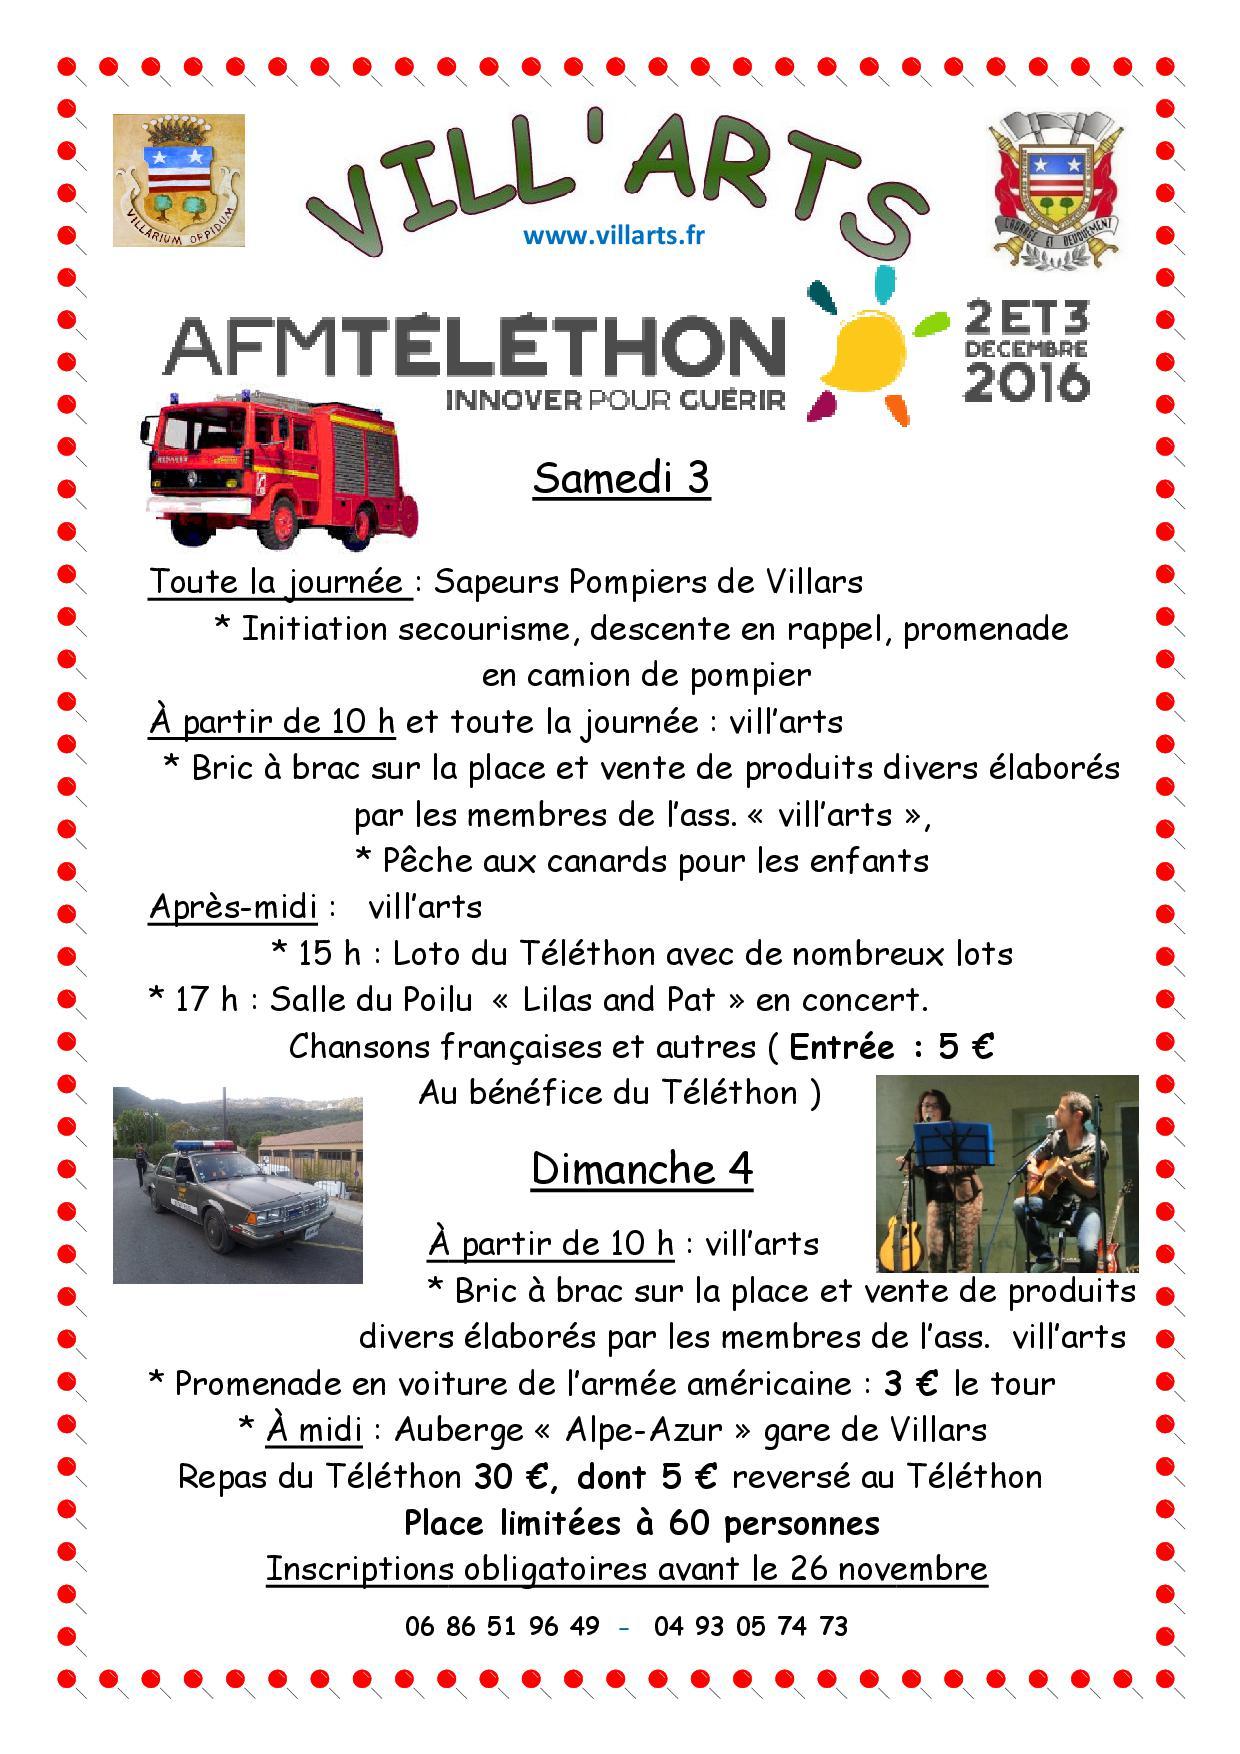 telethon-2016-affiche